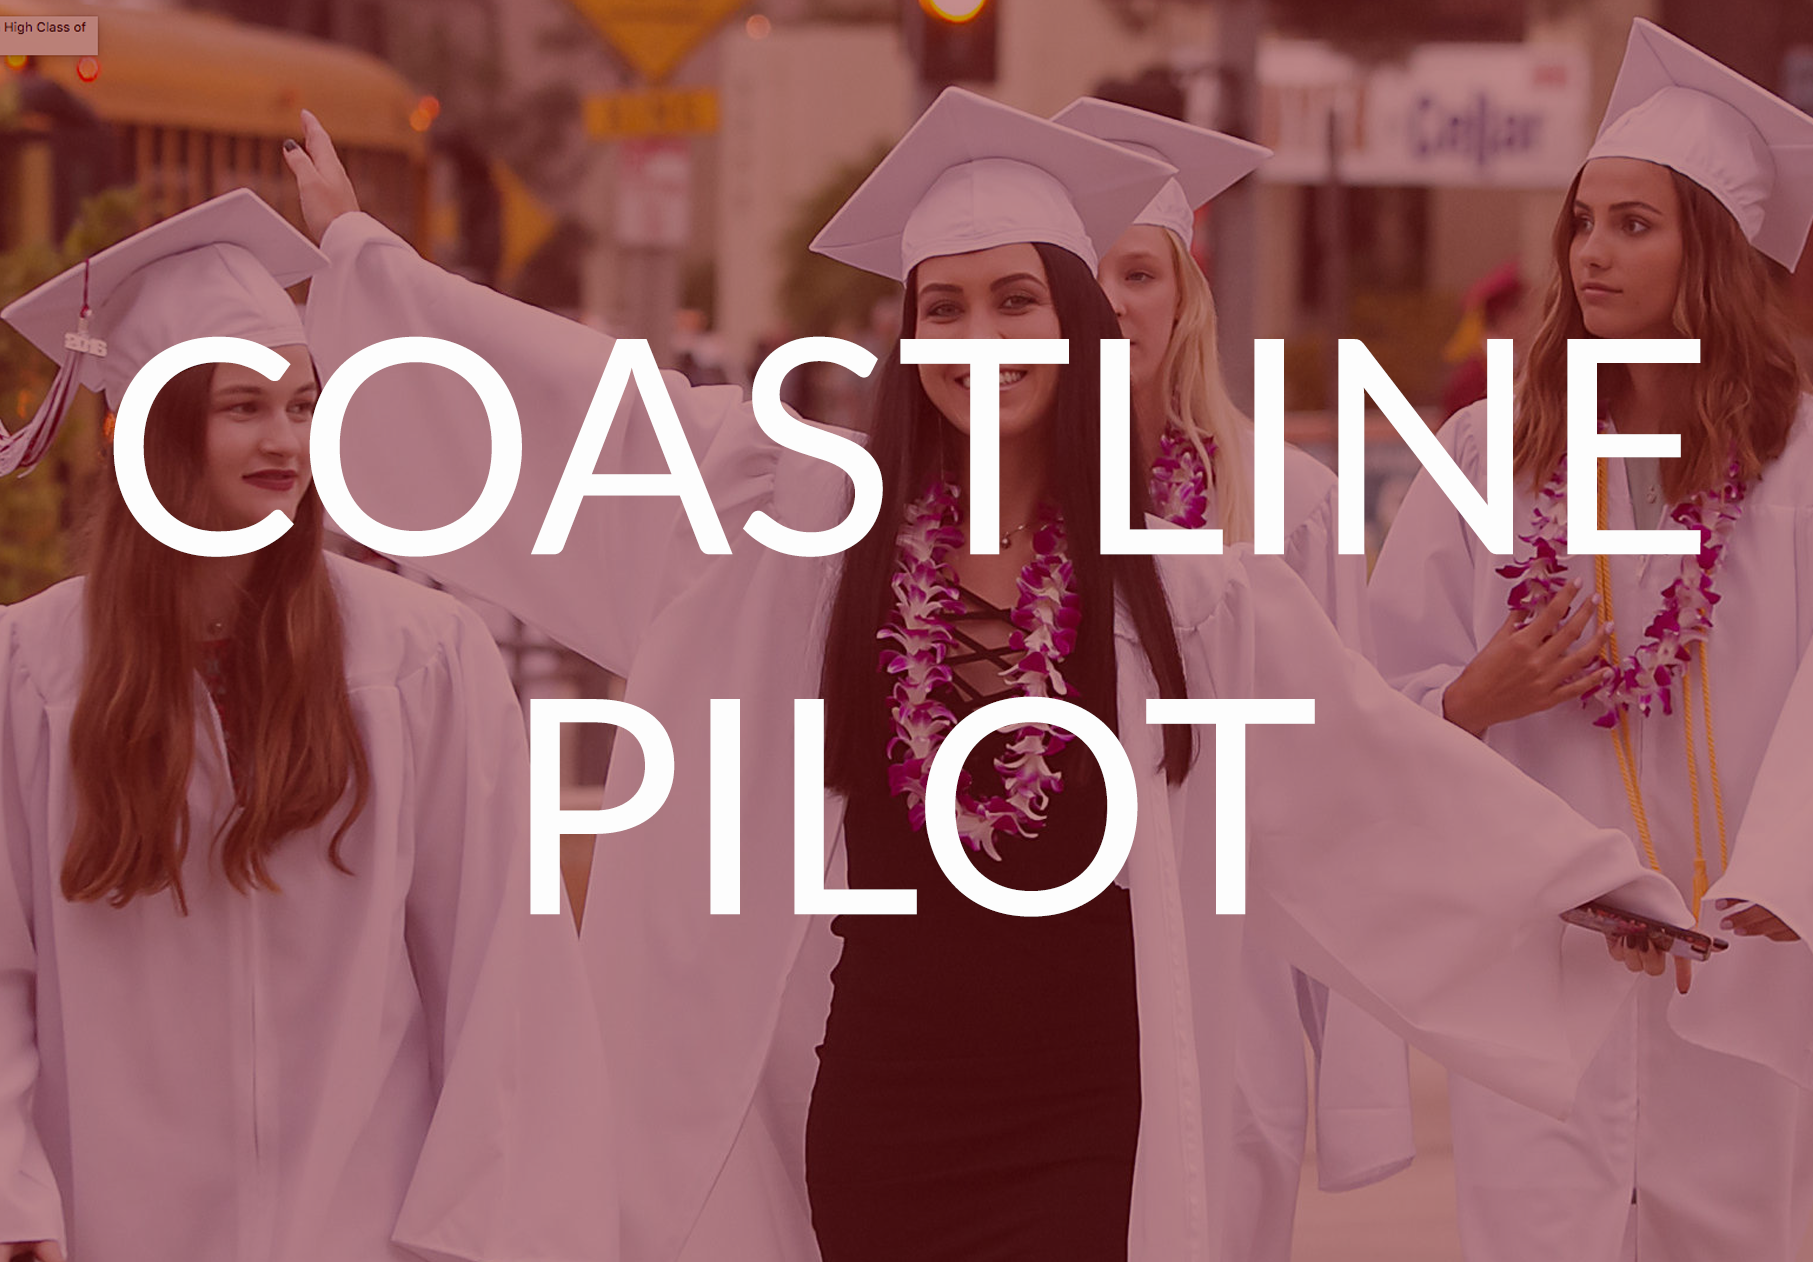 Coastline Pilot - Graduation Photos